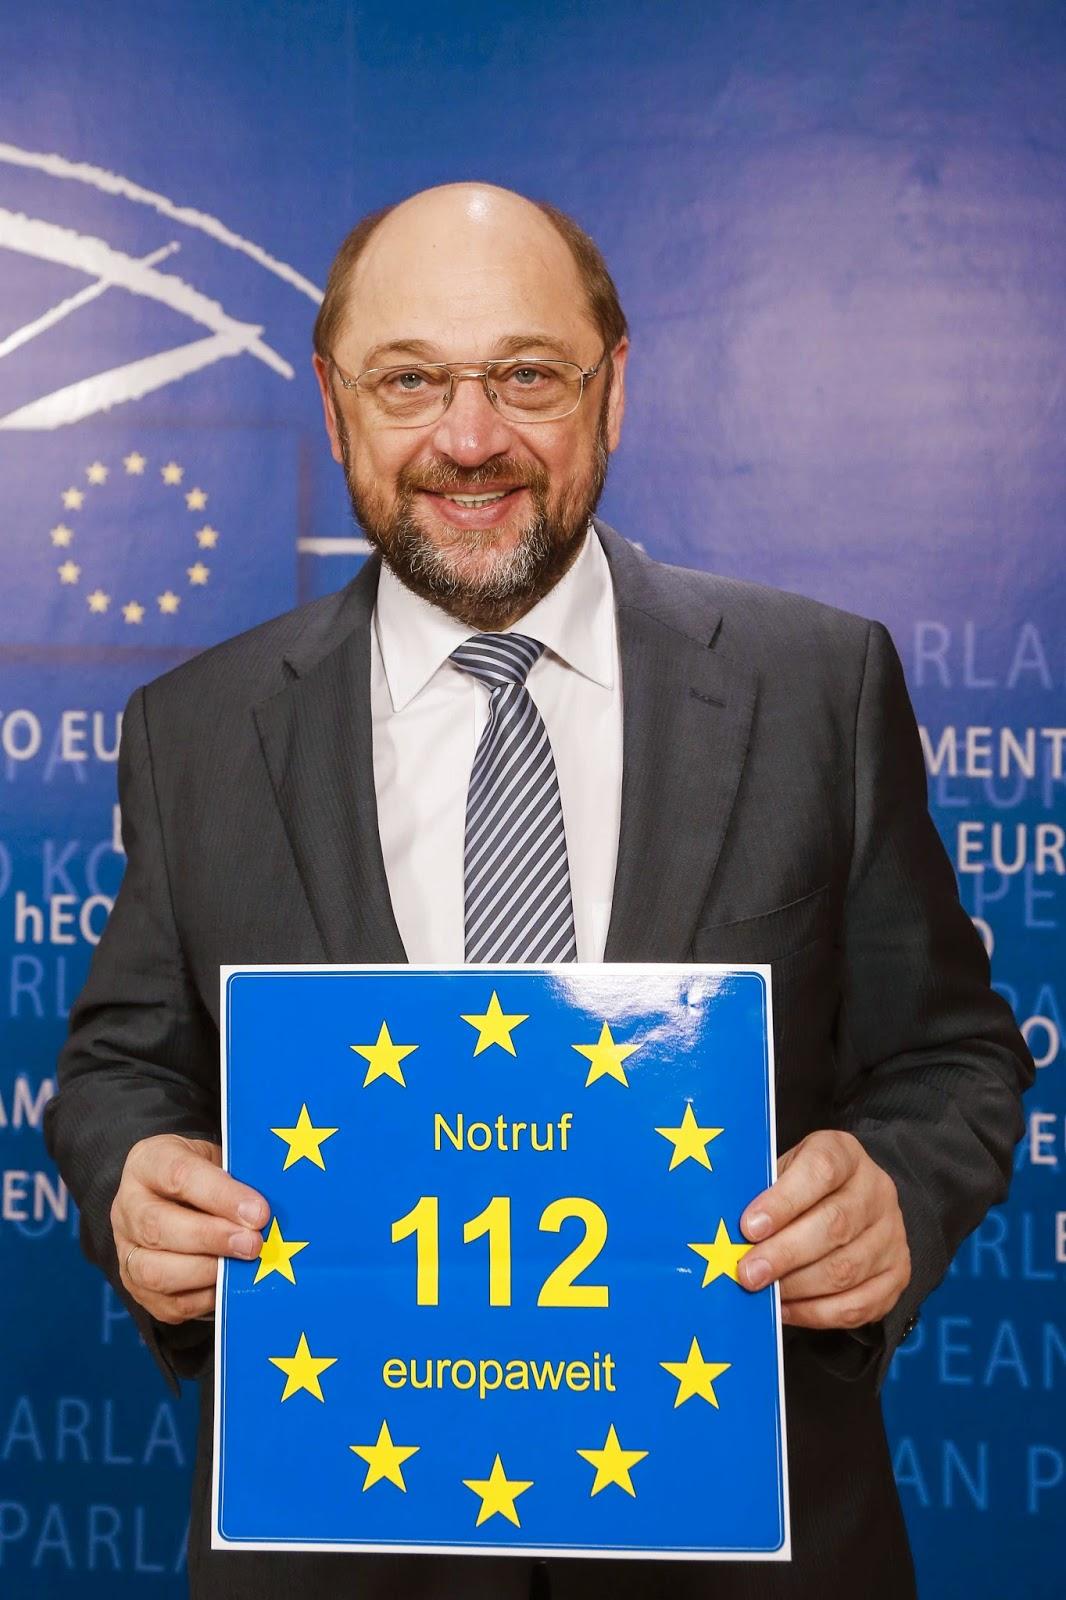 Euronotruf 112 Martin Schulz